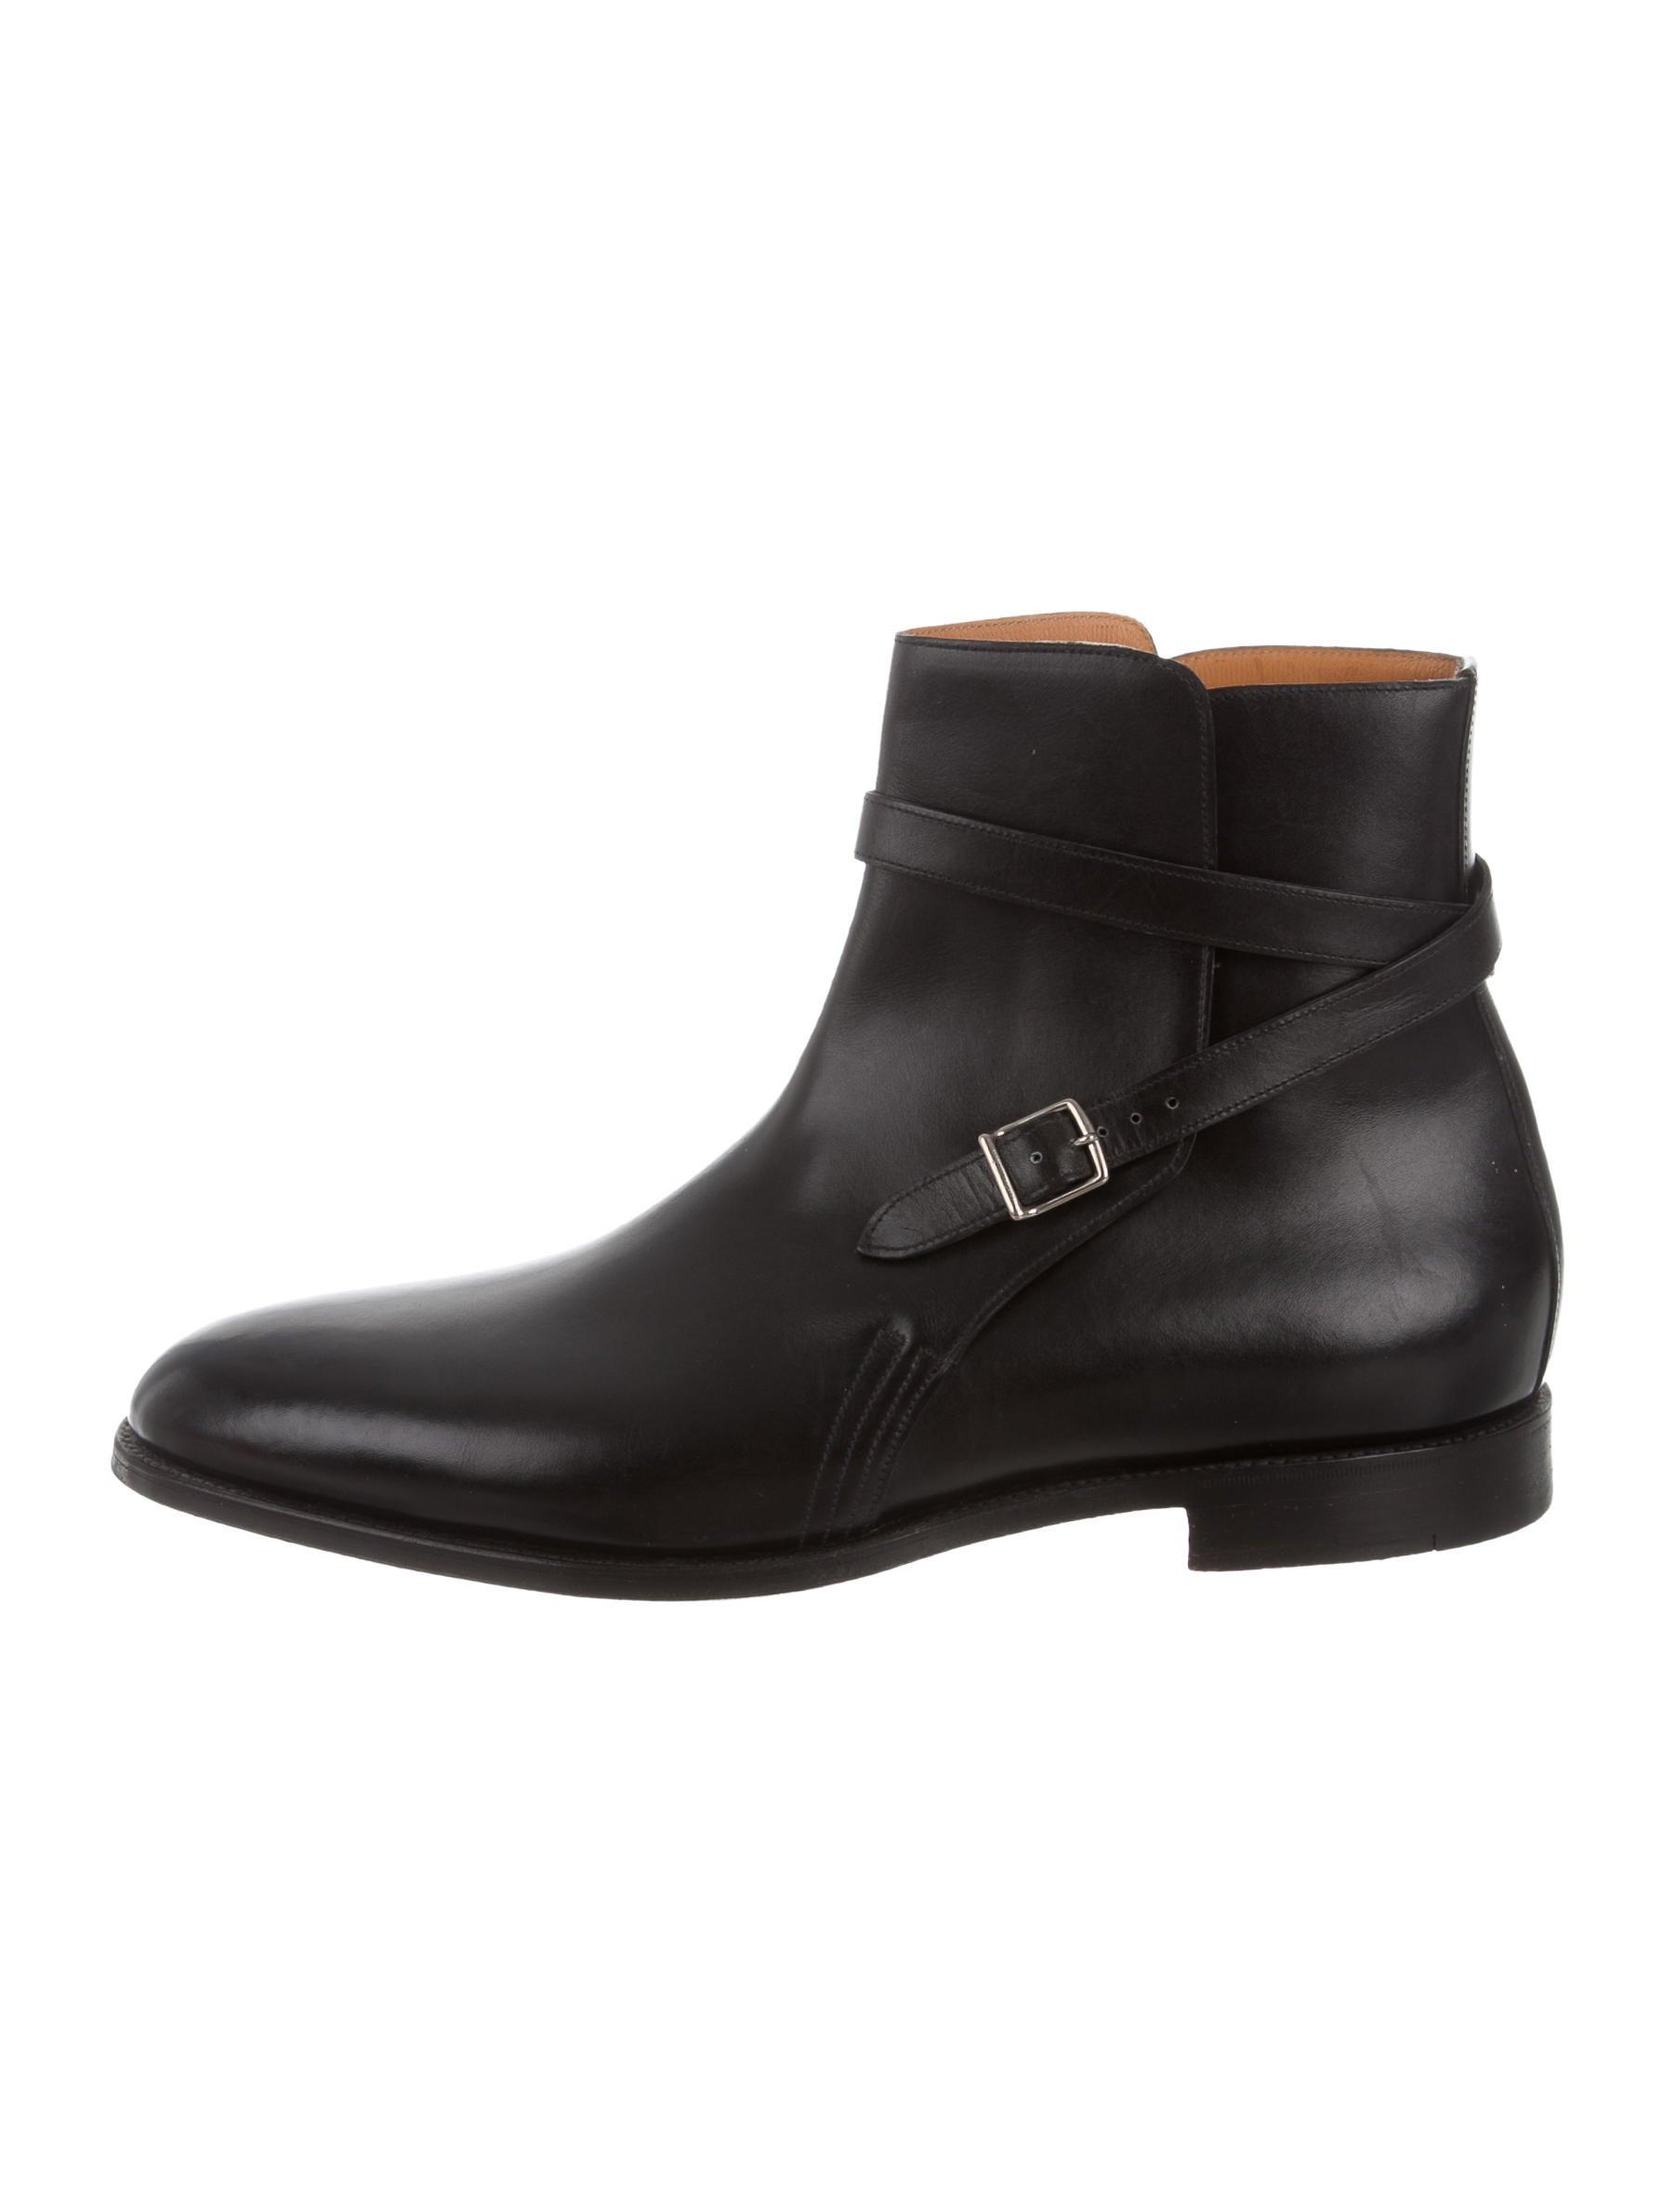 lobb jodhpur ankle boots shoes jol20288 the